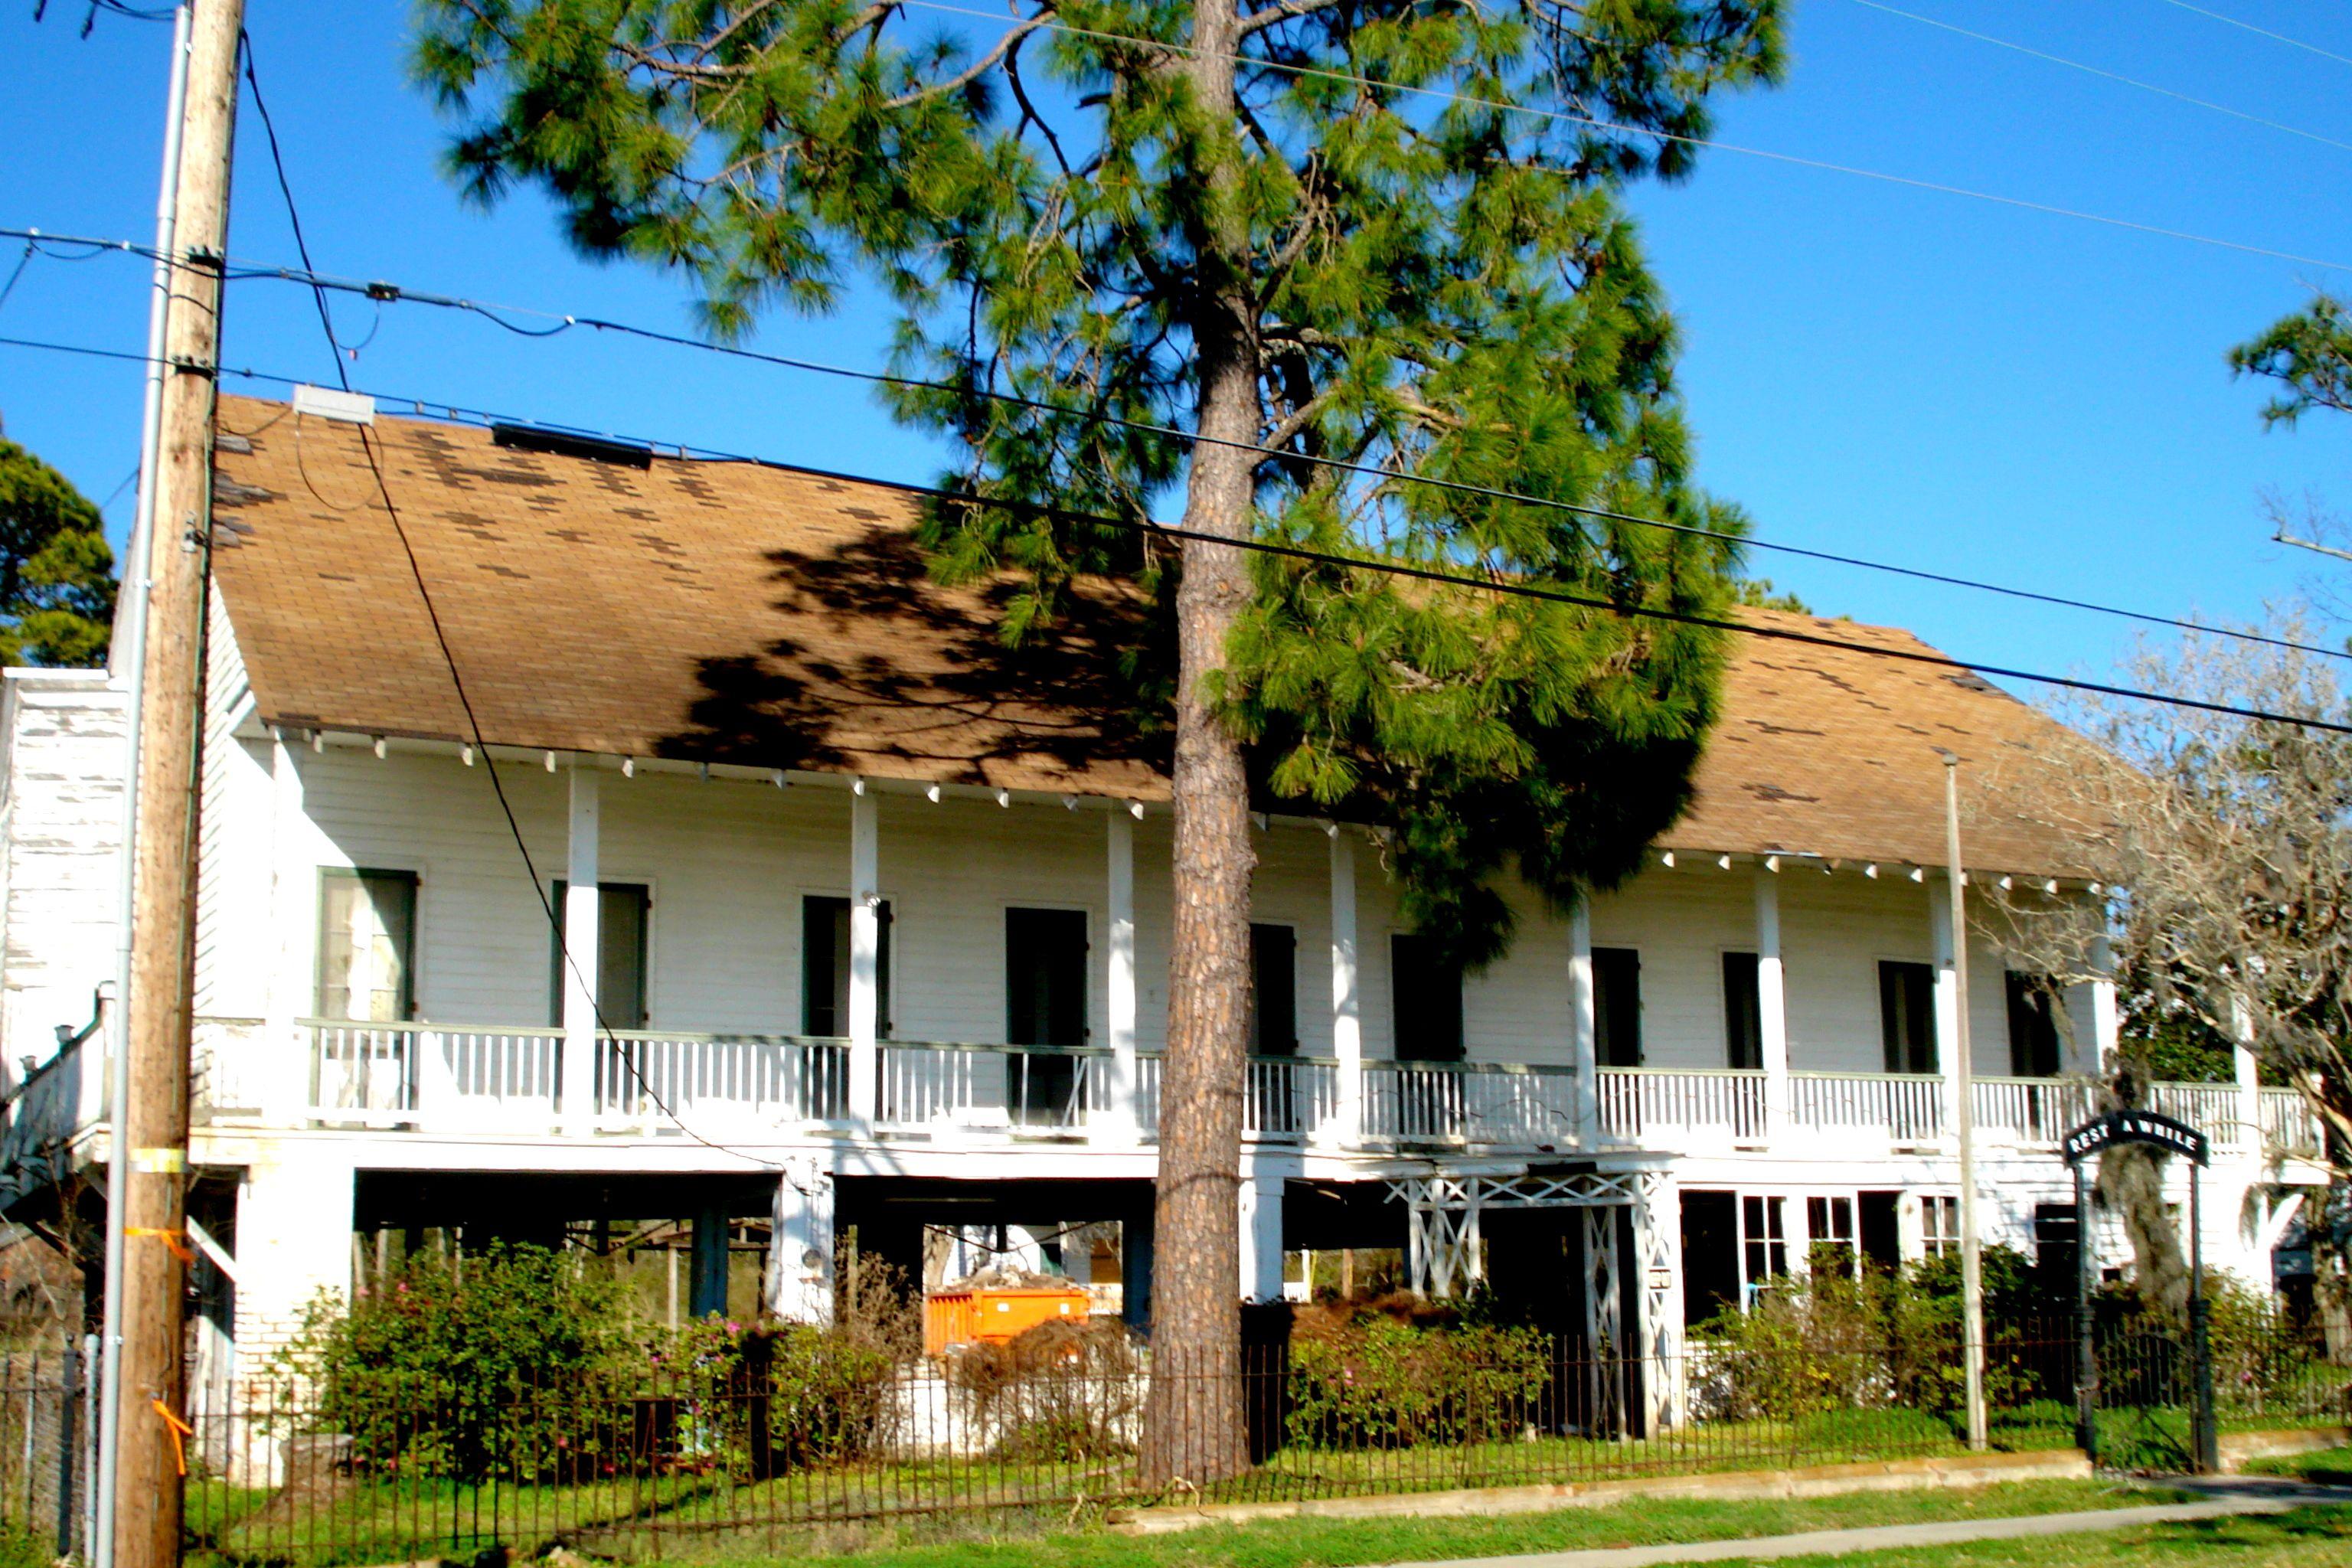 Mandeville Lakefront - Louisiana | Louisiana - My Home | Pinterest ...